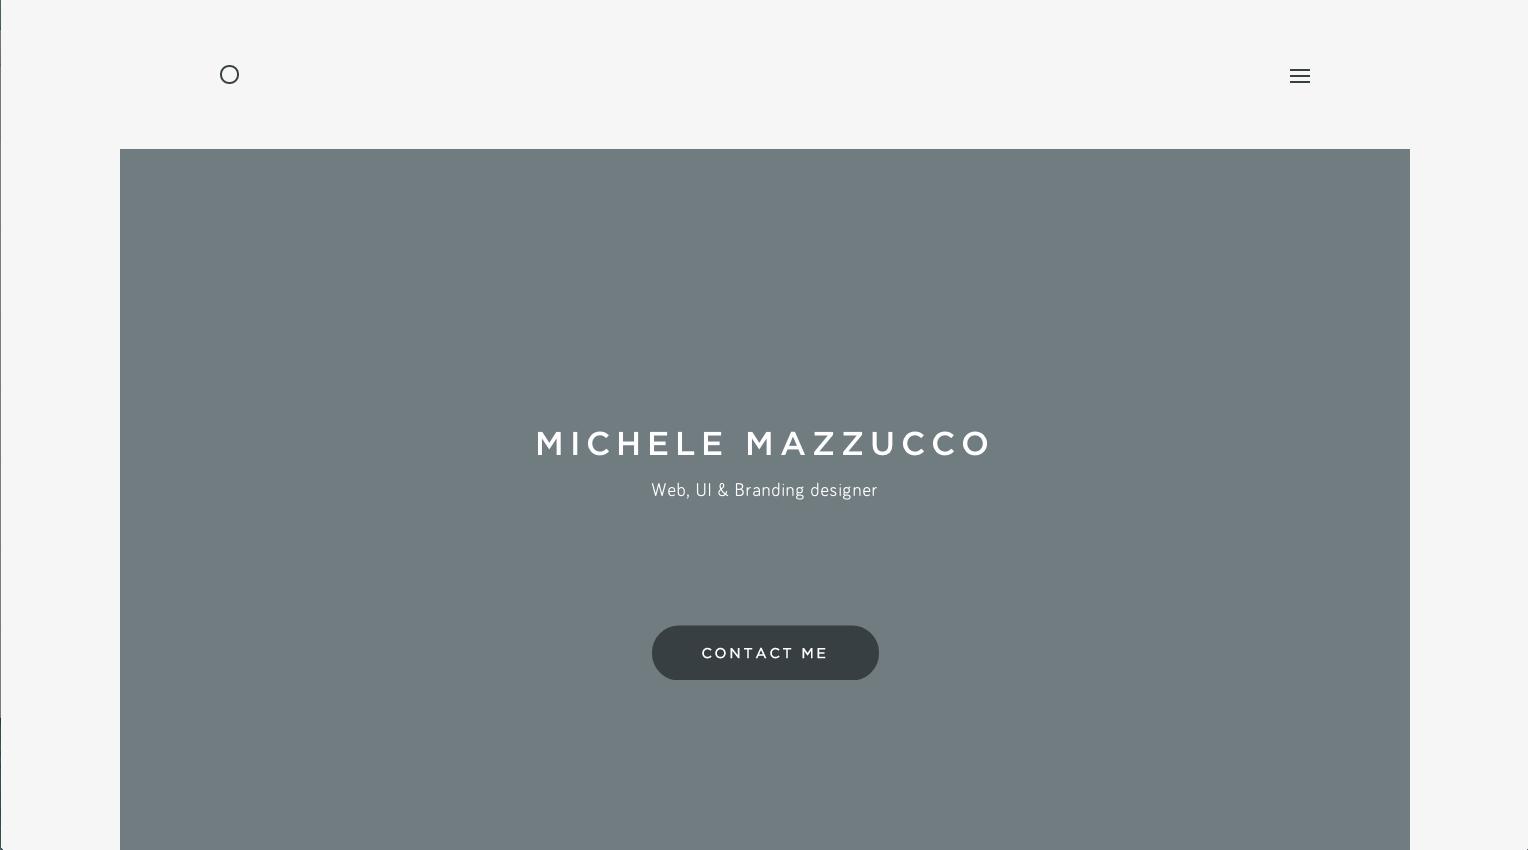 Адаптивный дизайн сайта пример